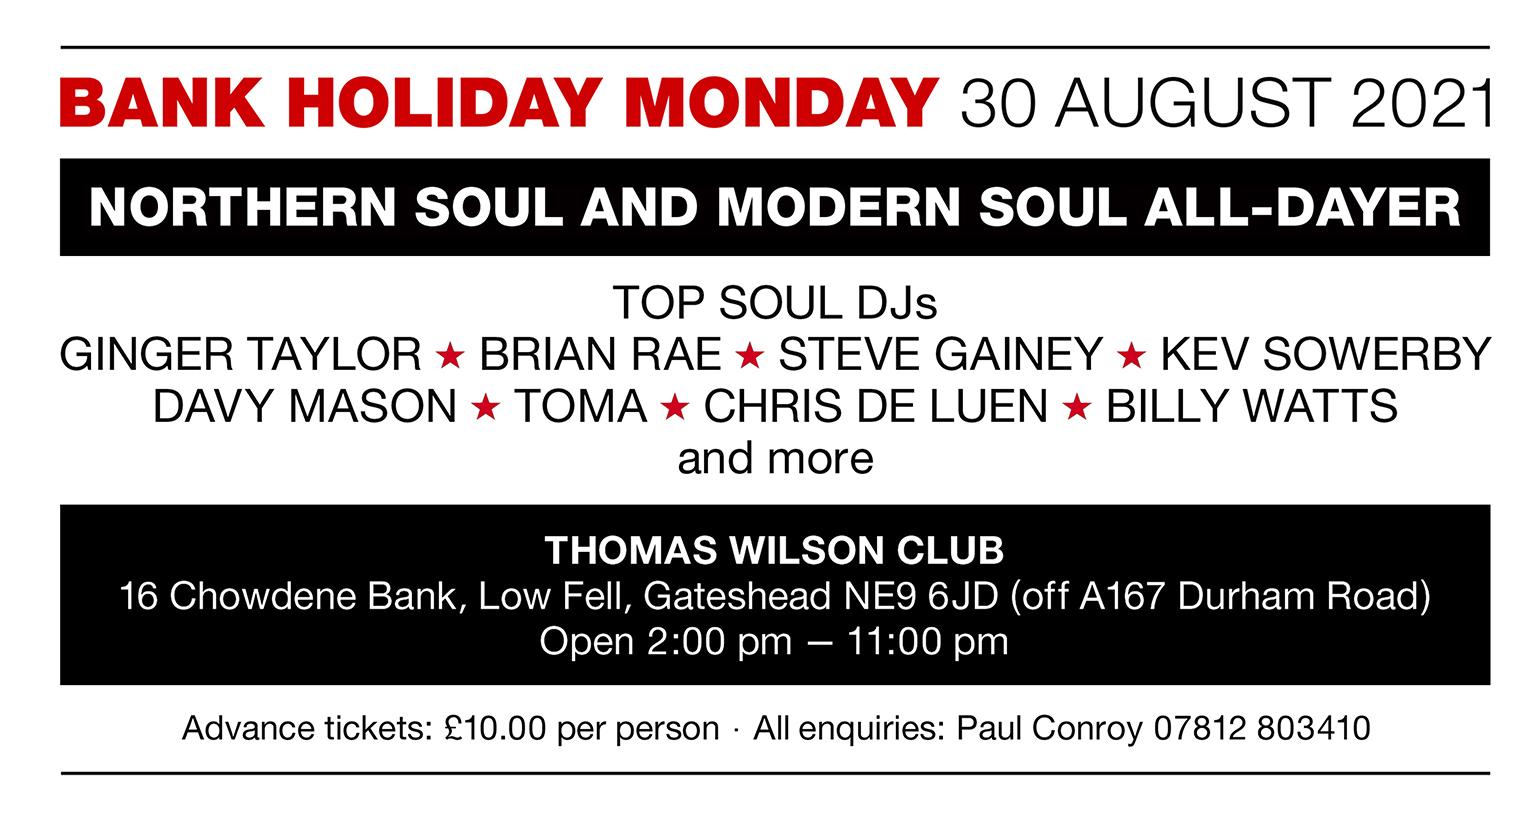 Northern  Modern Soul Mini All Dayer flyer